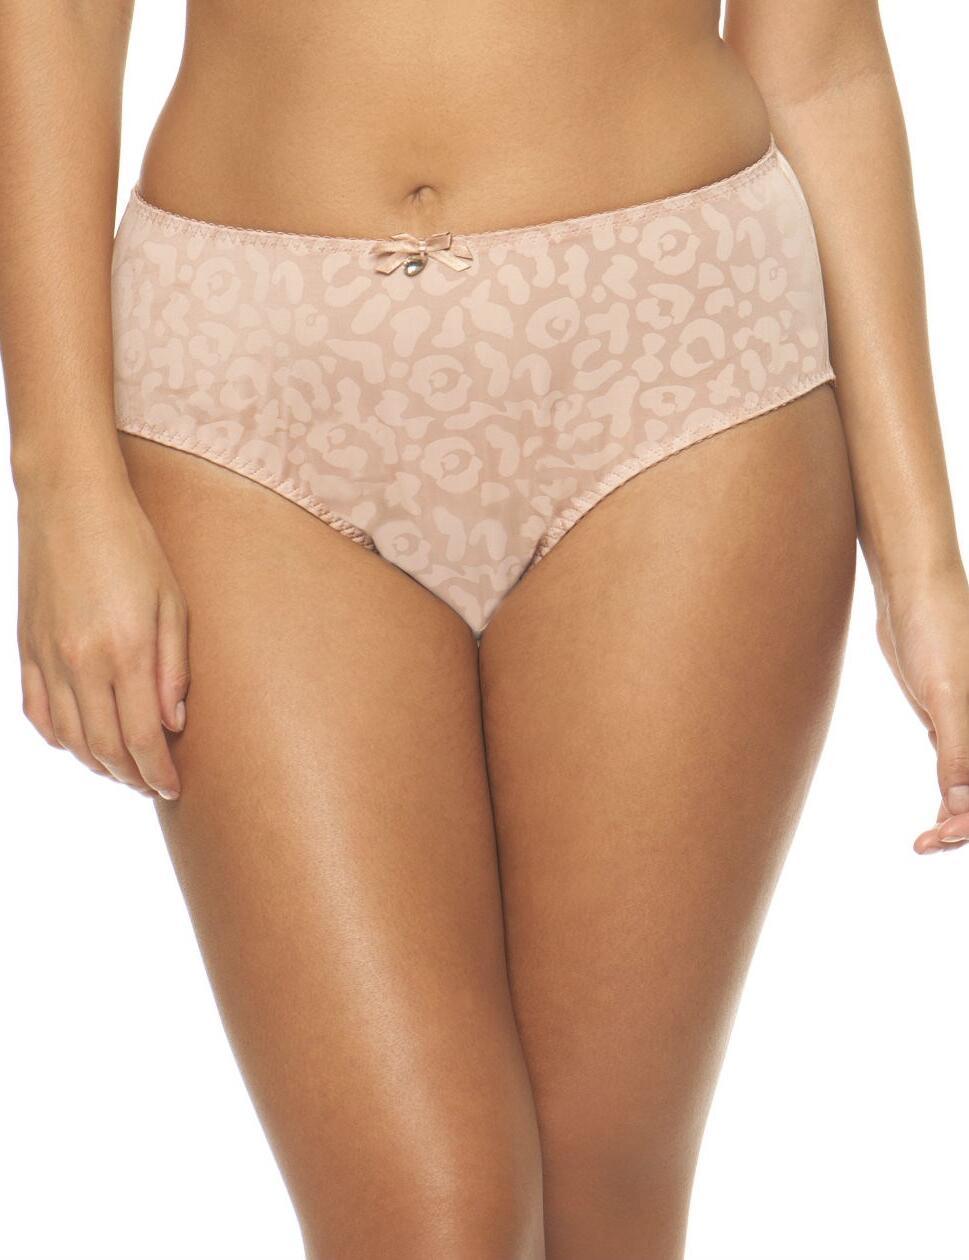 Curvy Kate Smoothie: shaper brief 50% off - Blush